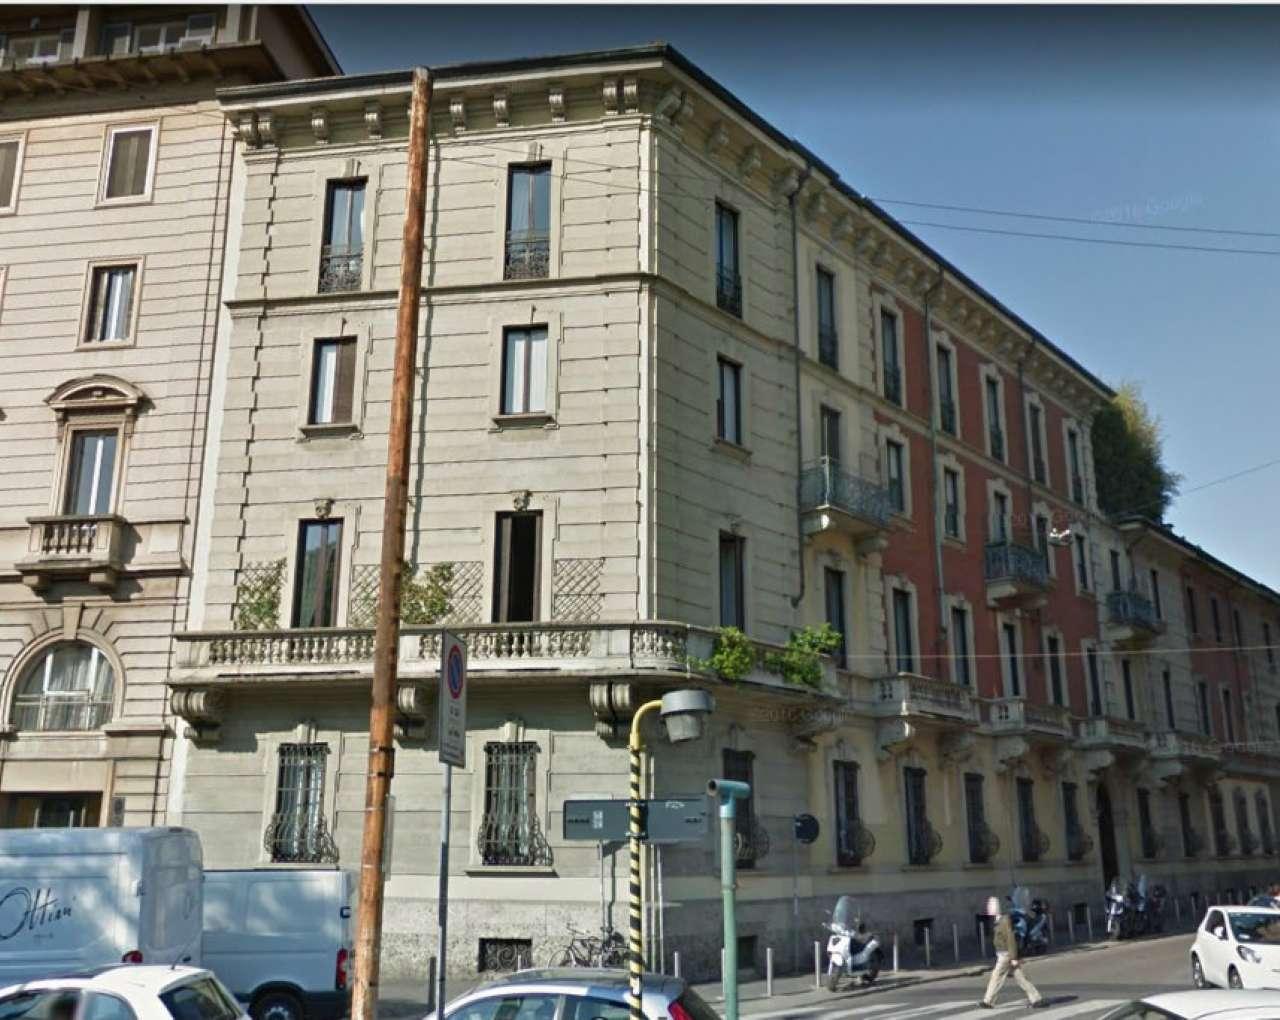 Appartamento affitto con giardino privato a milano - Casa con giardino milano ...